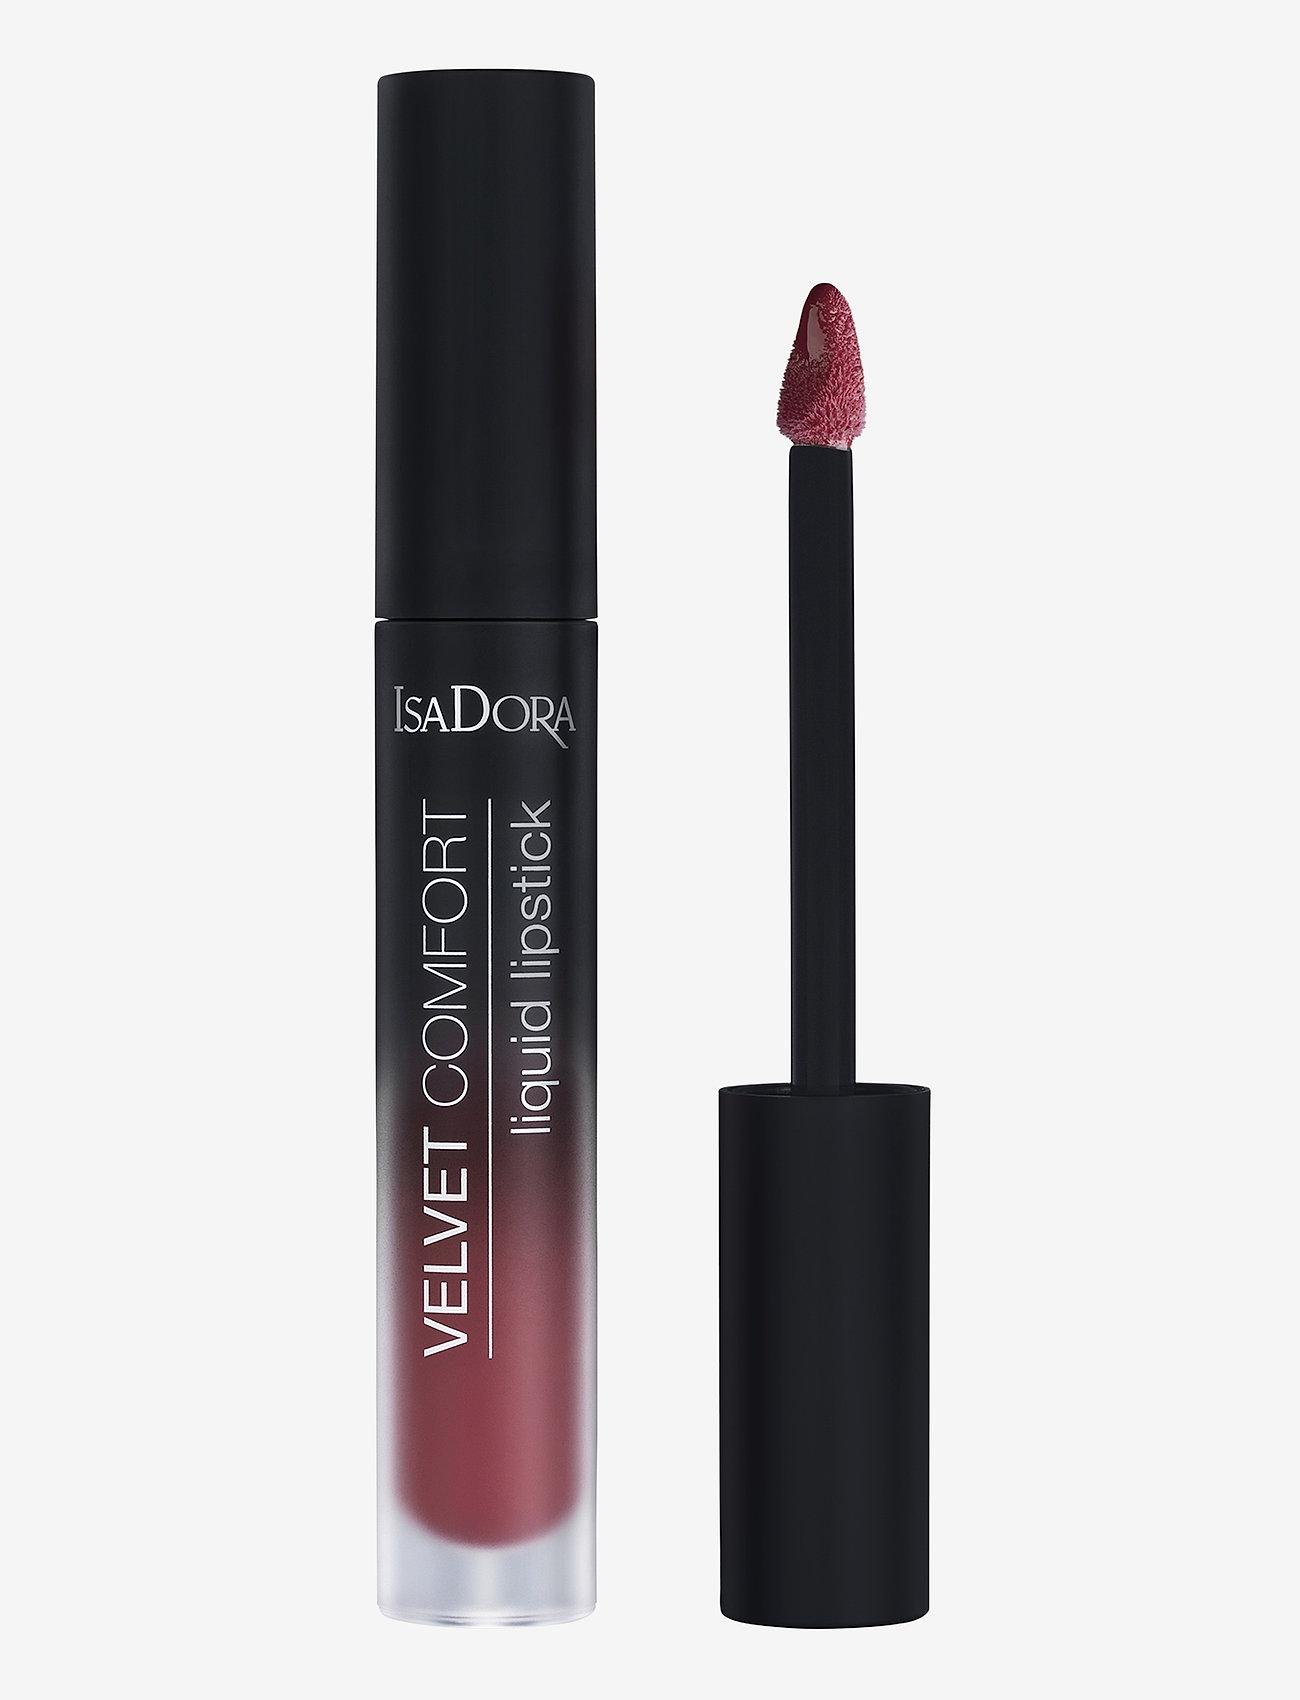 Isadora - Velvet Comfort Liquid Lipstick Red Plum - liquid lipstick - red plum - 1